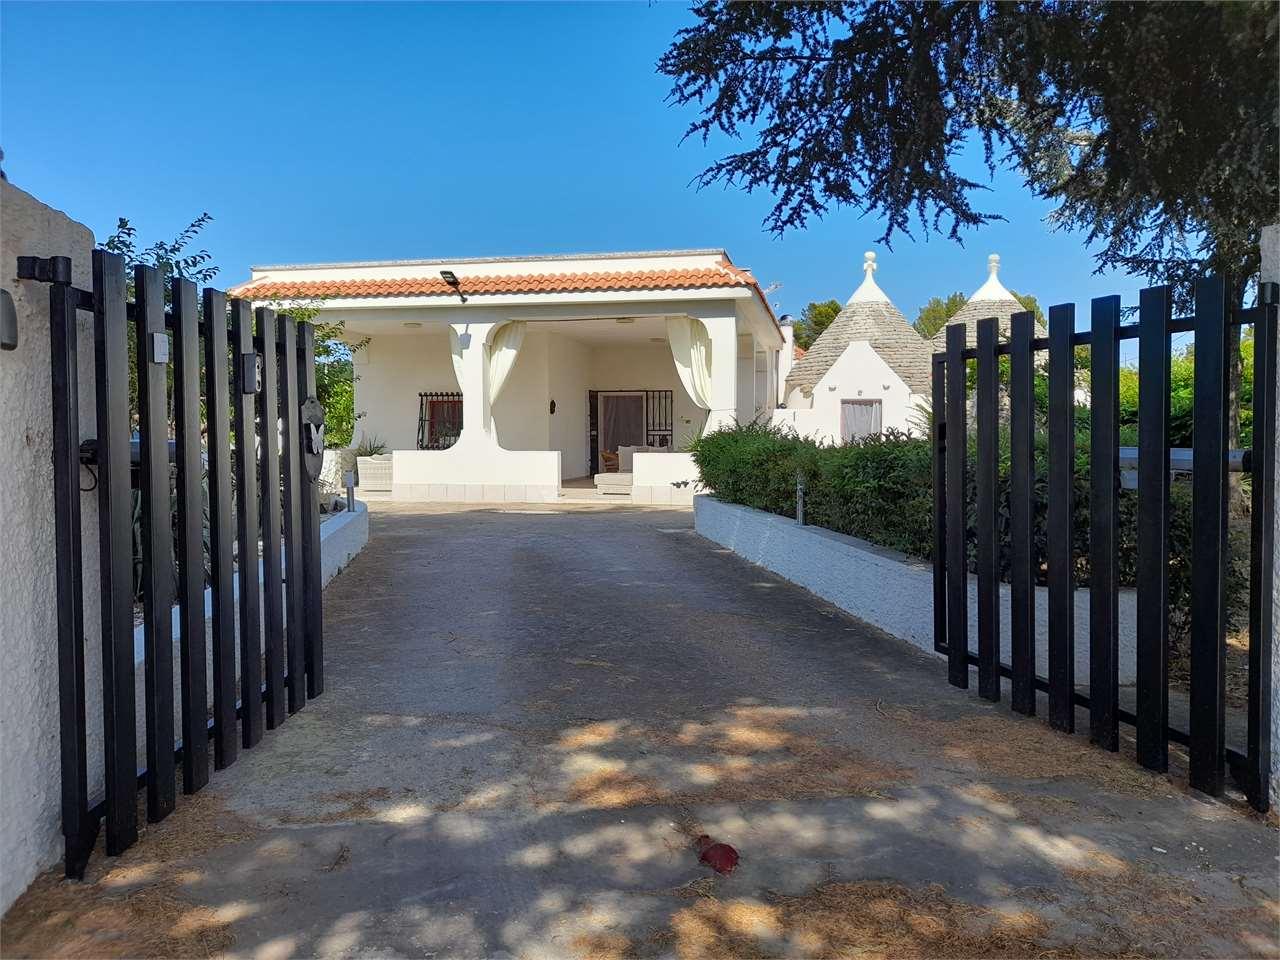 Villa & Trullo Farfalle